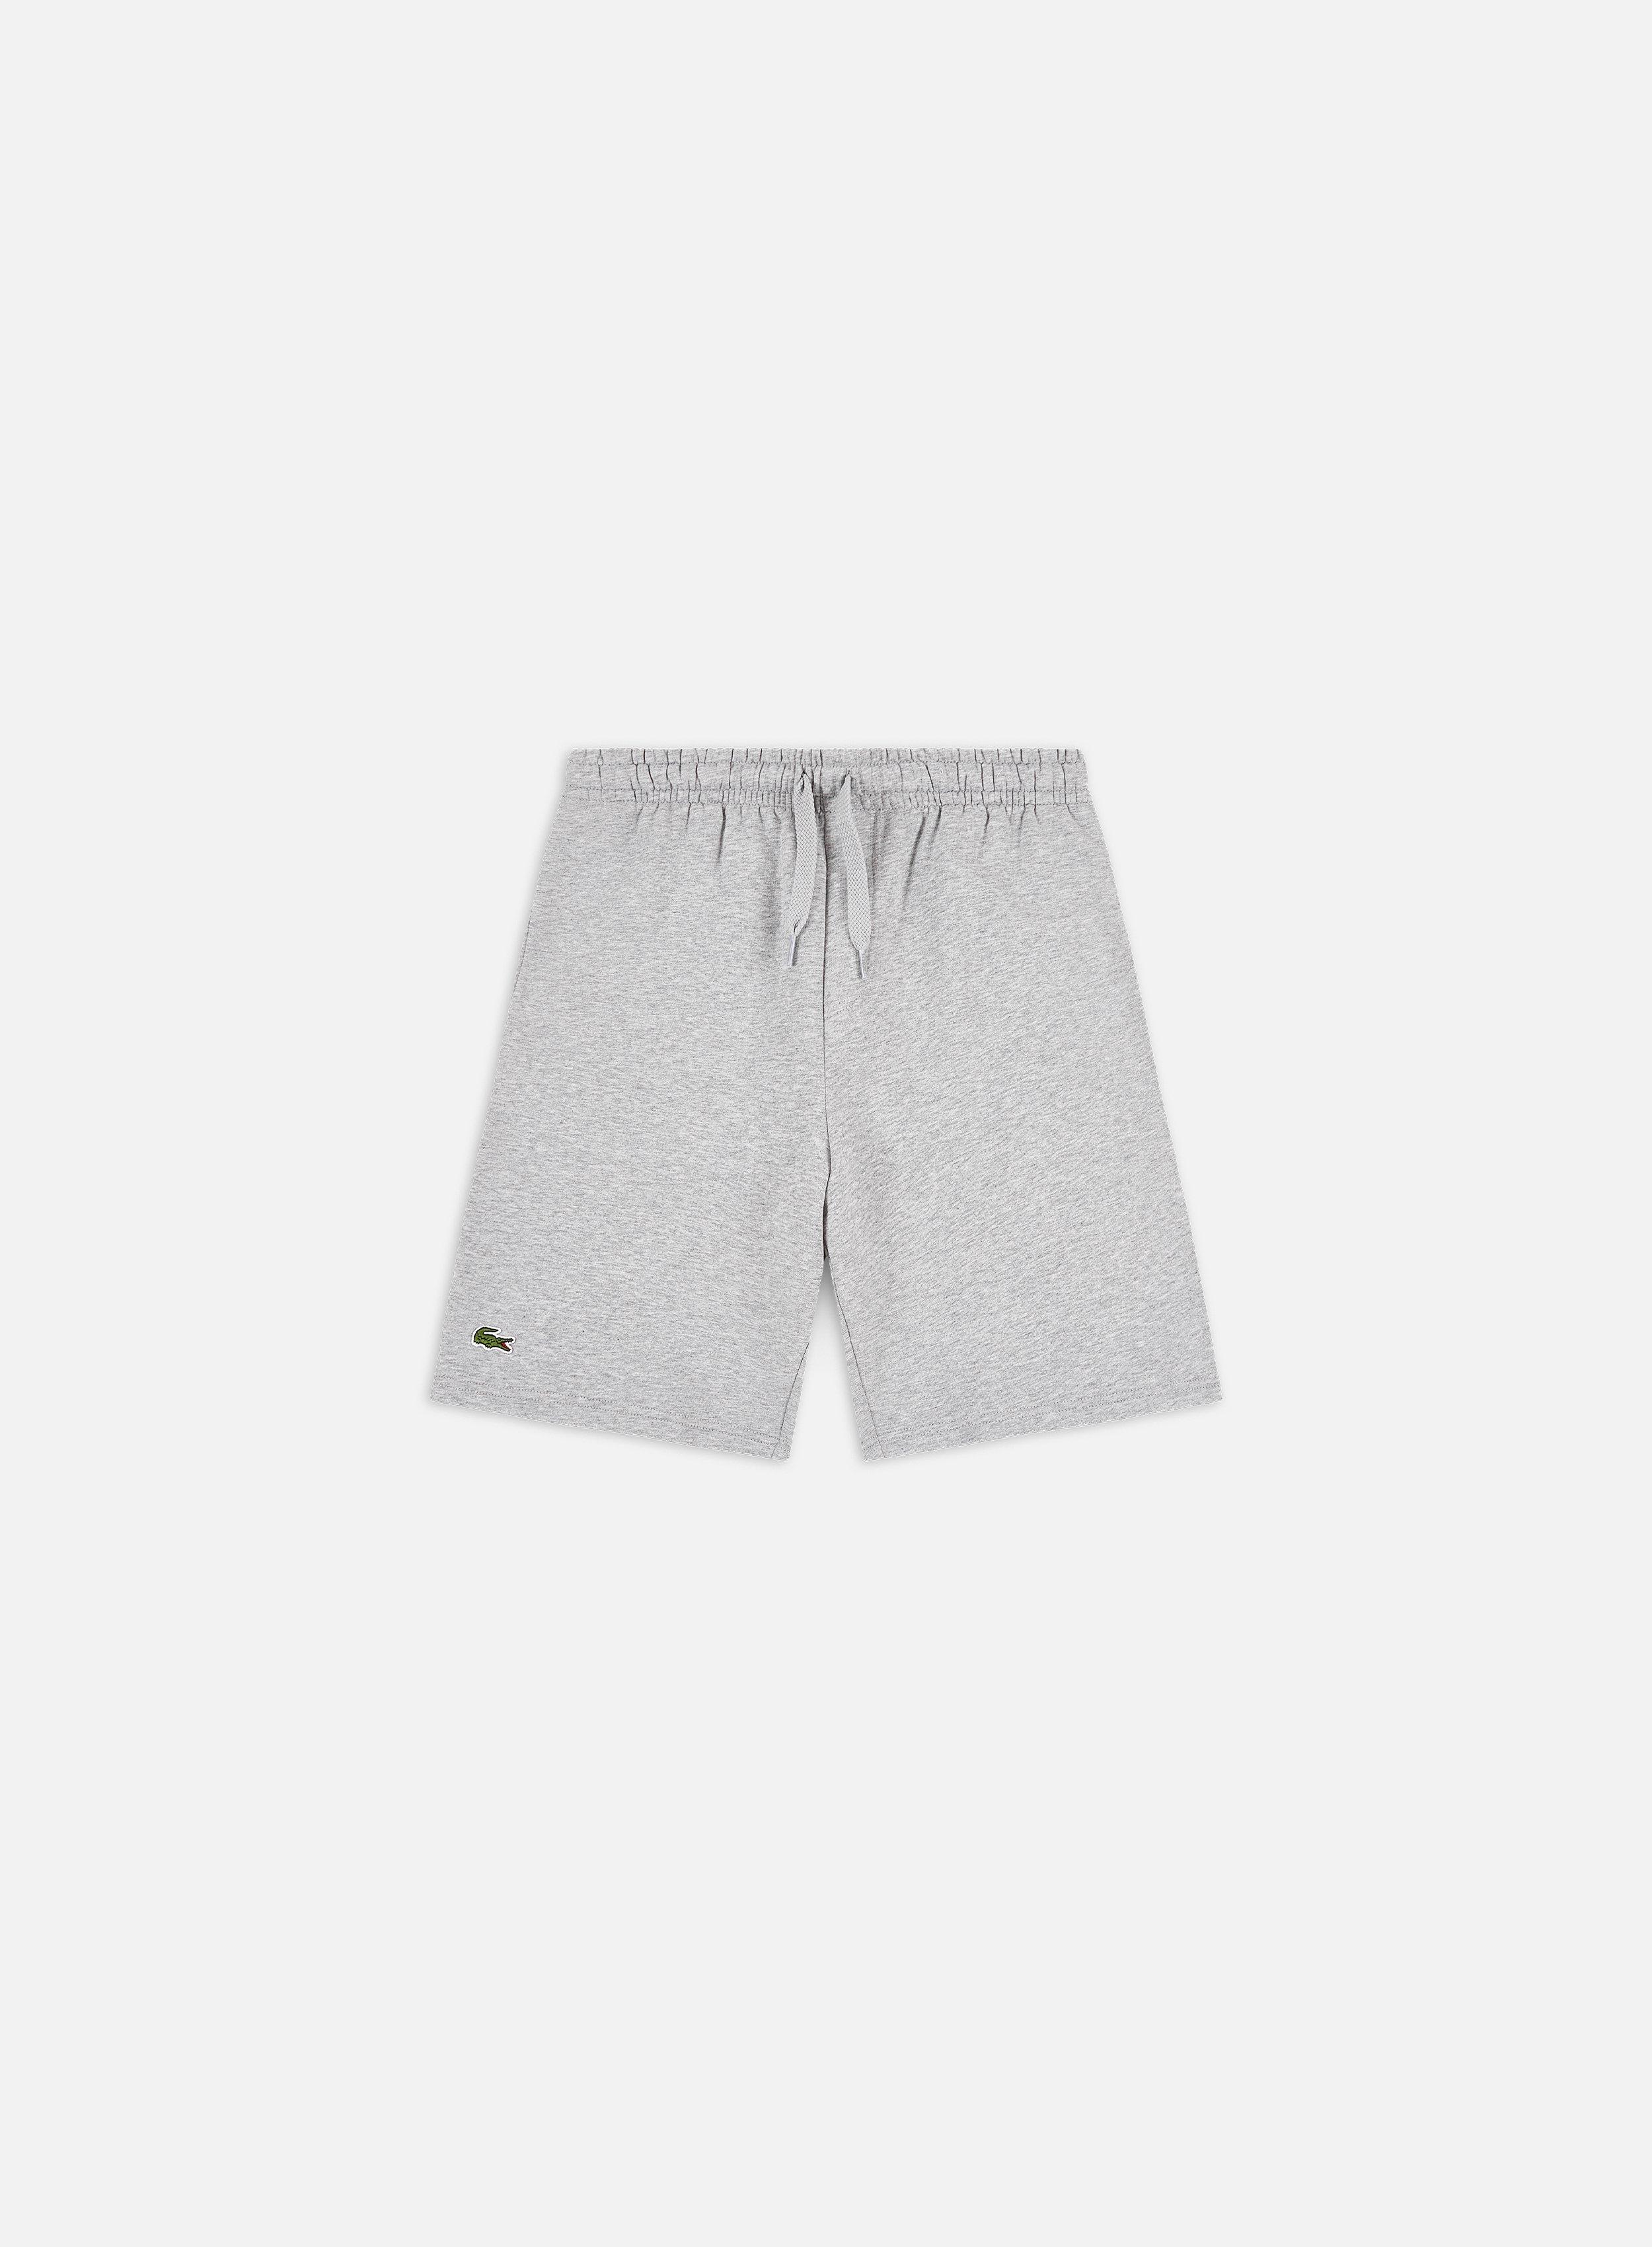 Grey soft cotton blend Lacoste Rear Pocket Fleece Shorts in Silver Chine